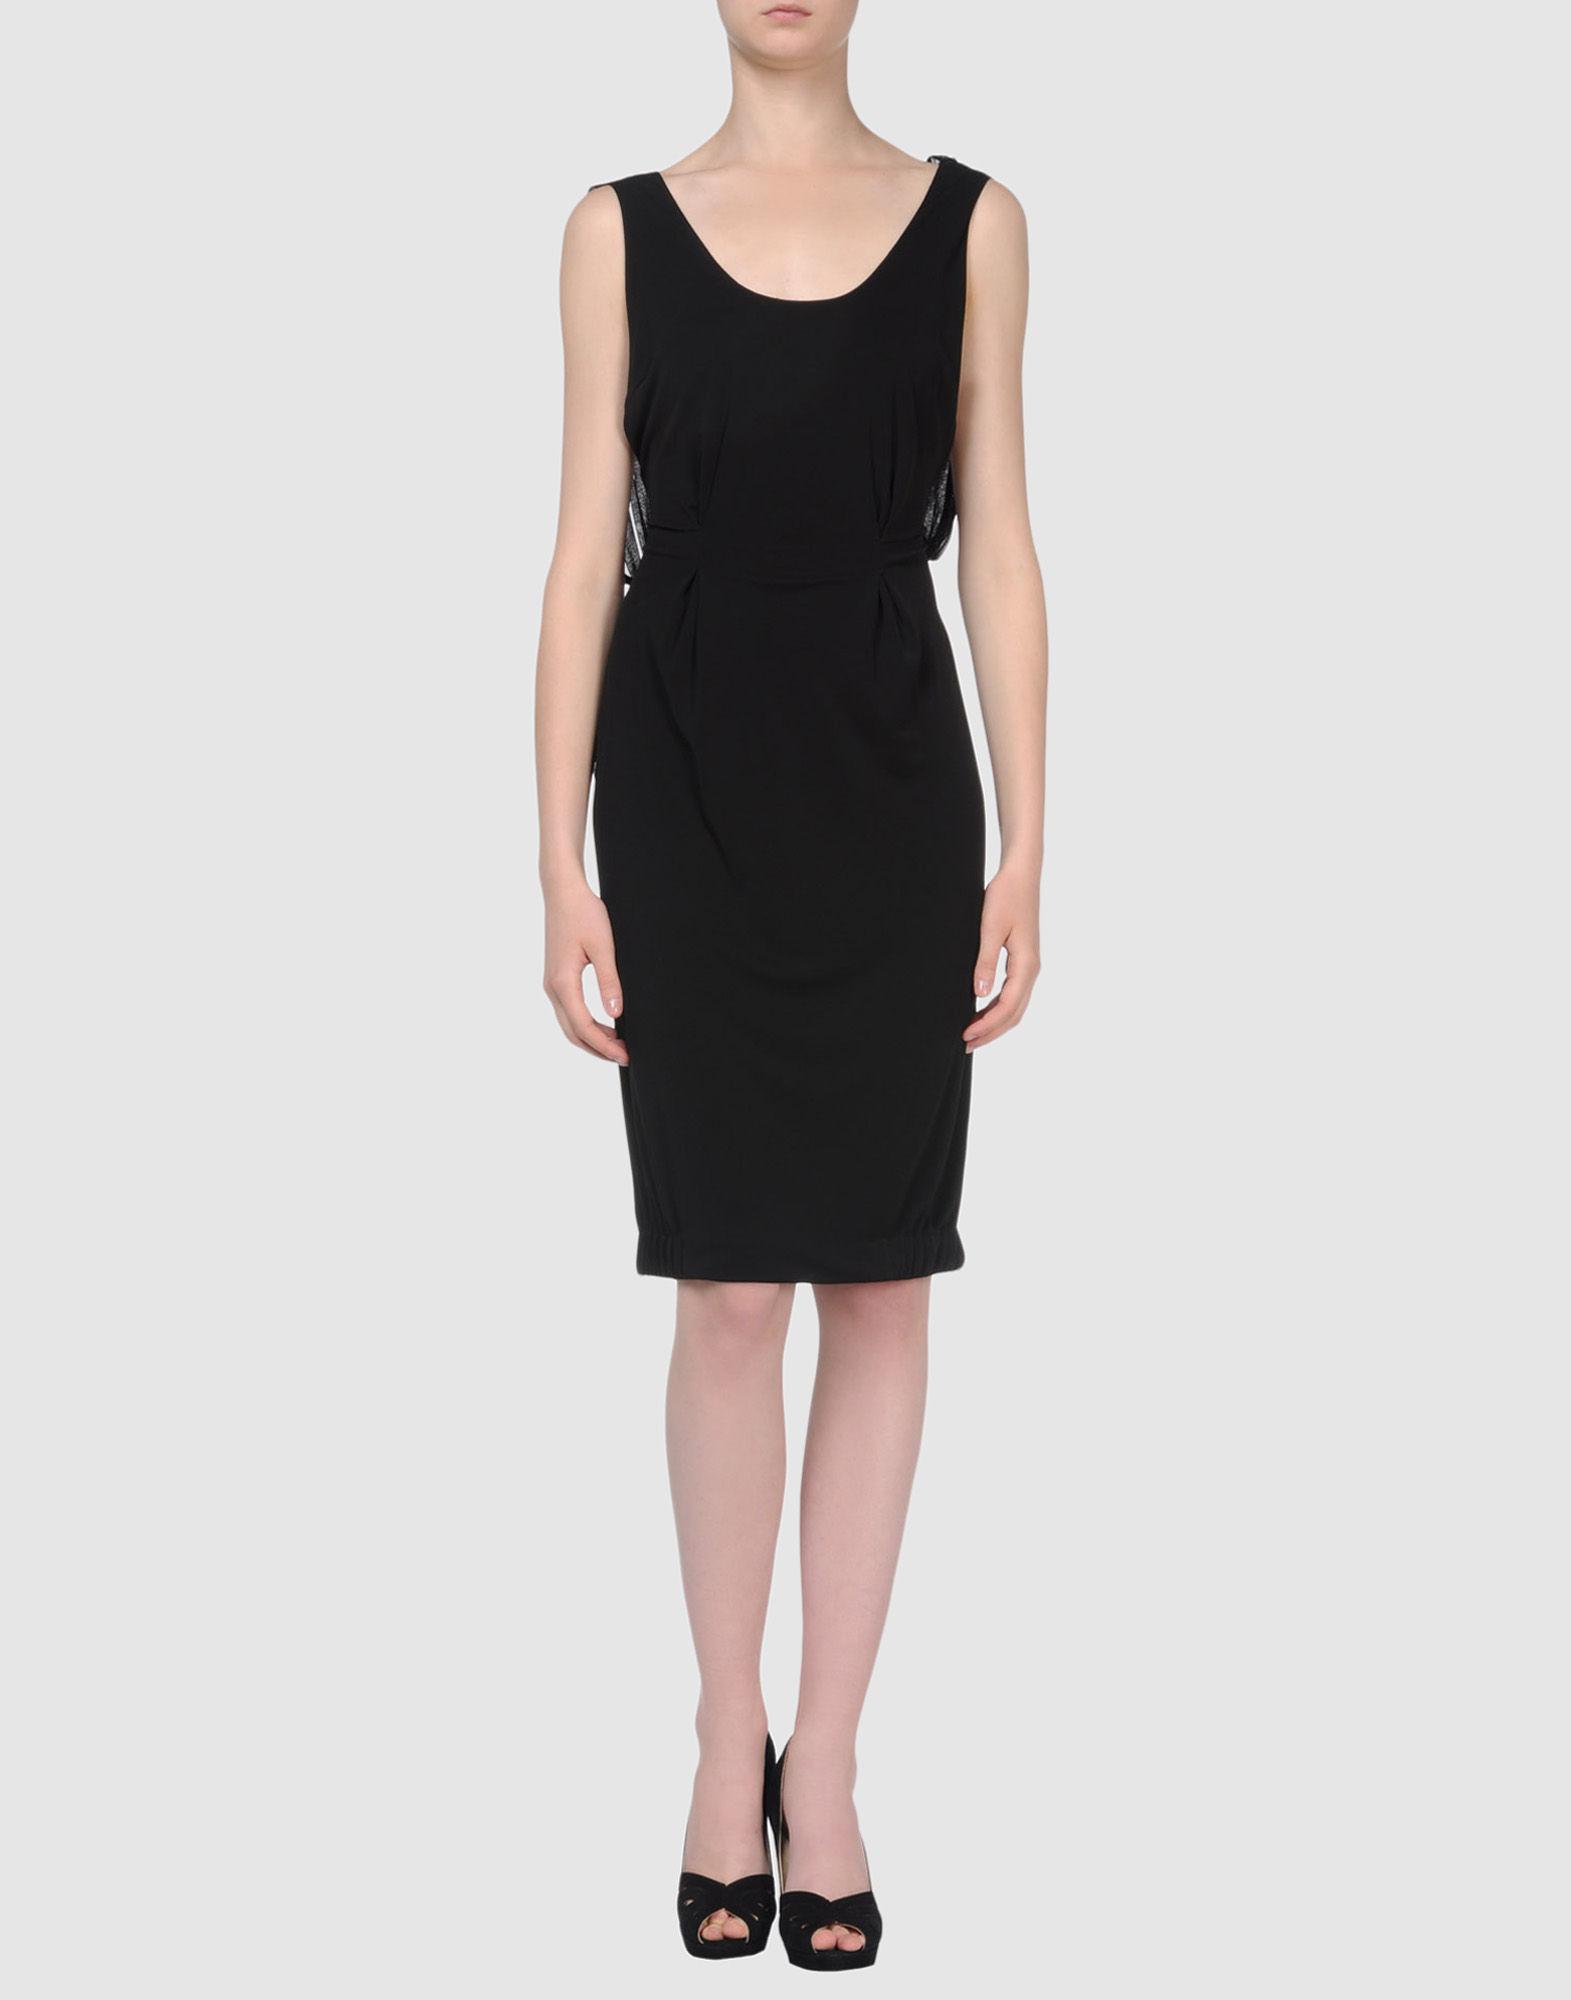 34178256CI 14 f - Βραδυνα Φορεματα Yves Saint Laurent Rive Gauche Κωδ.33